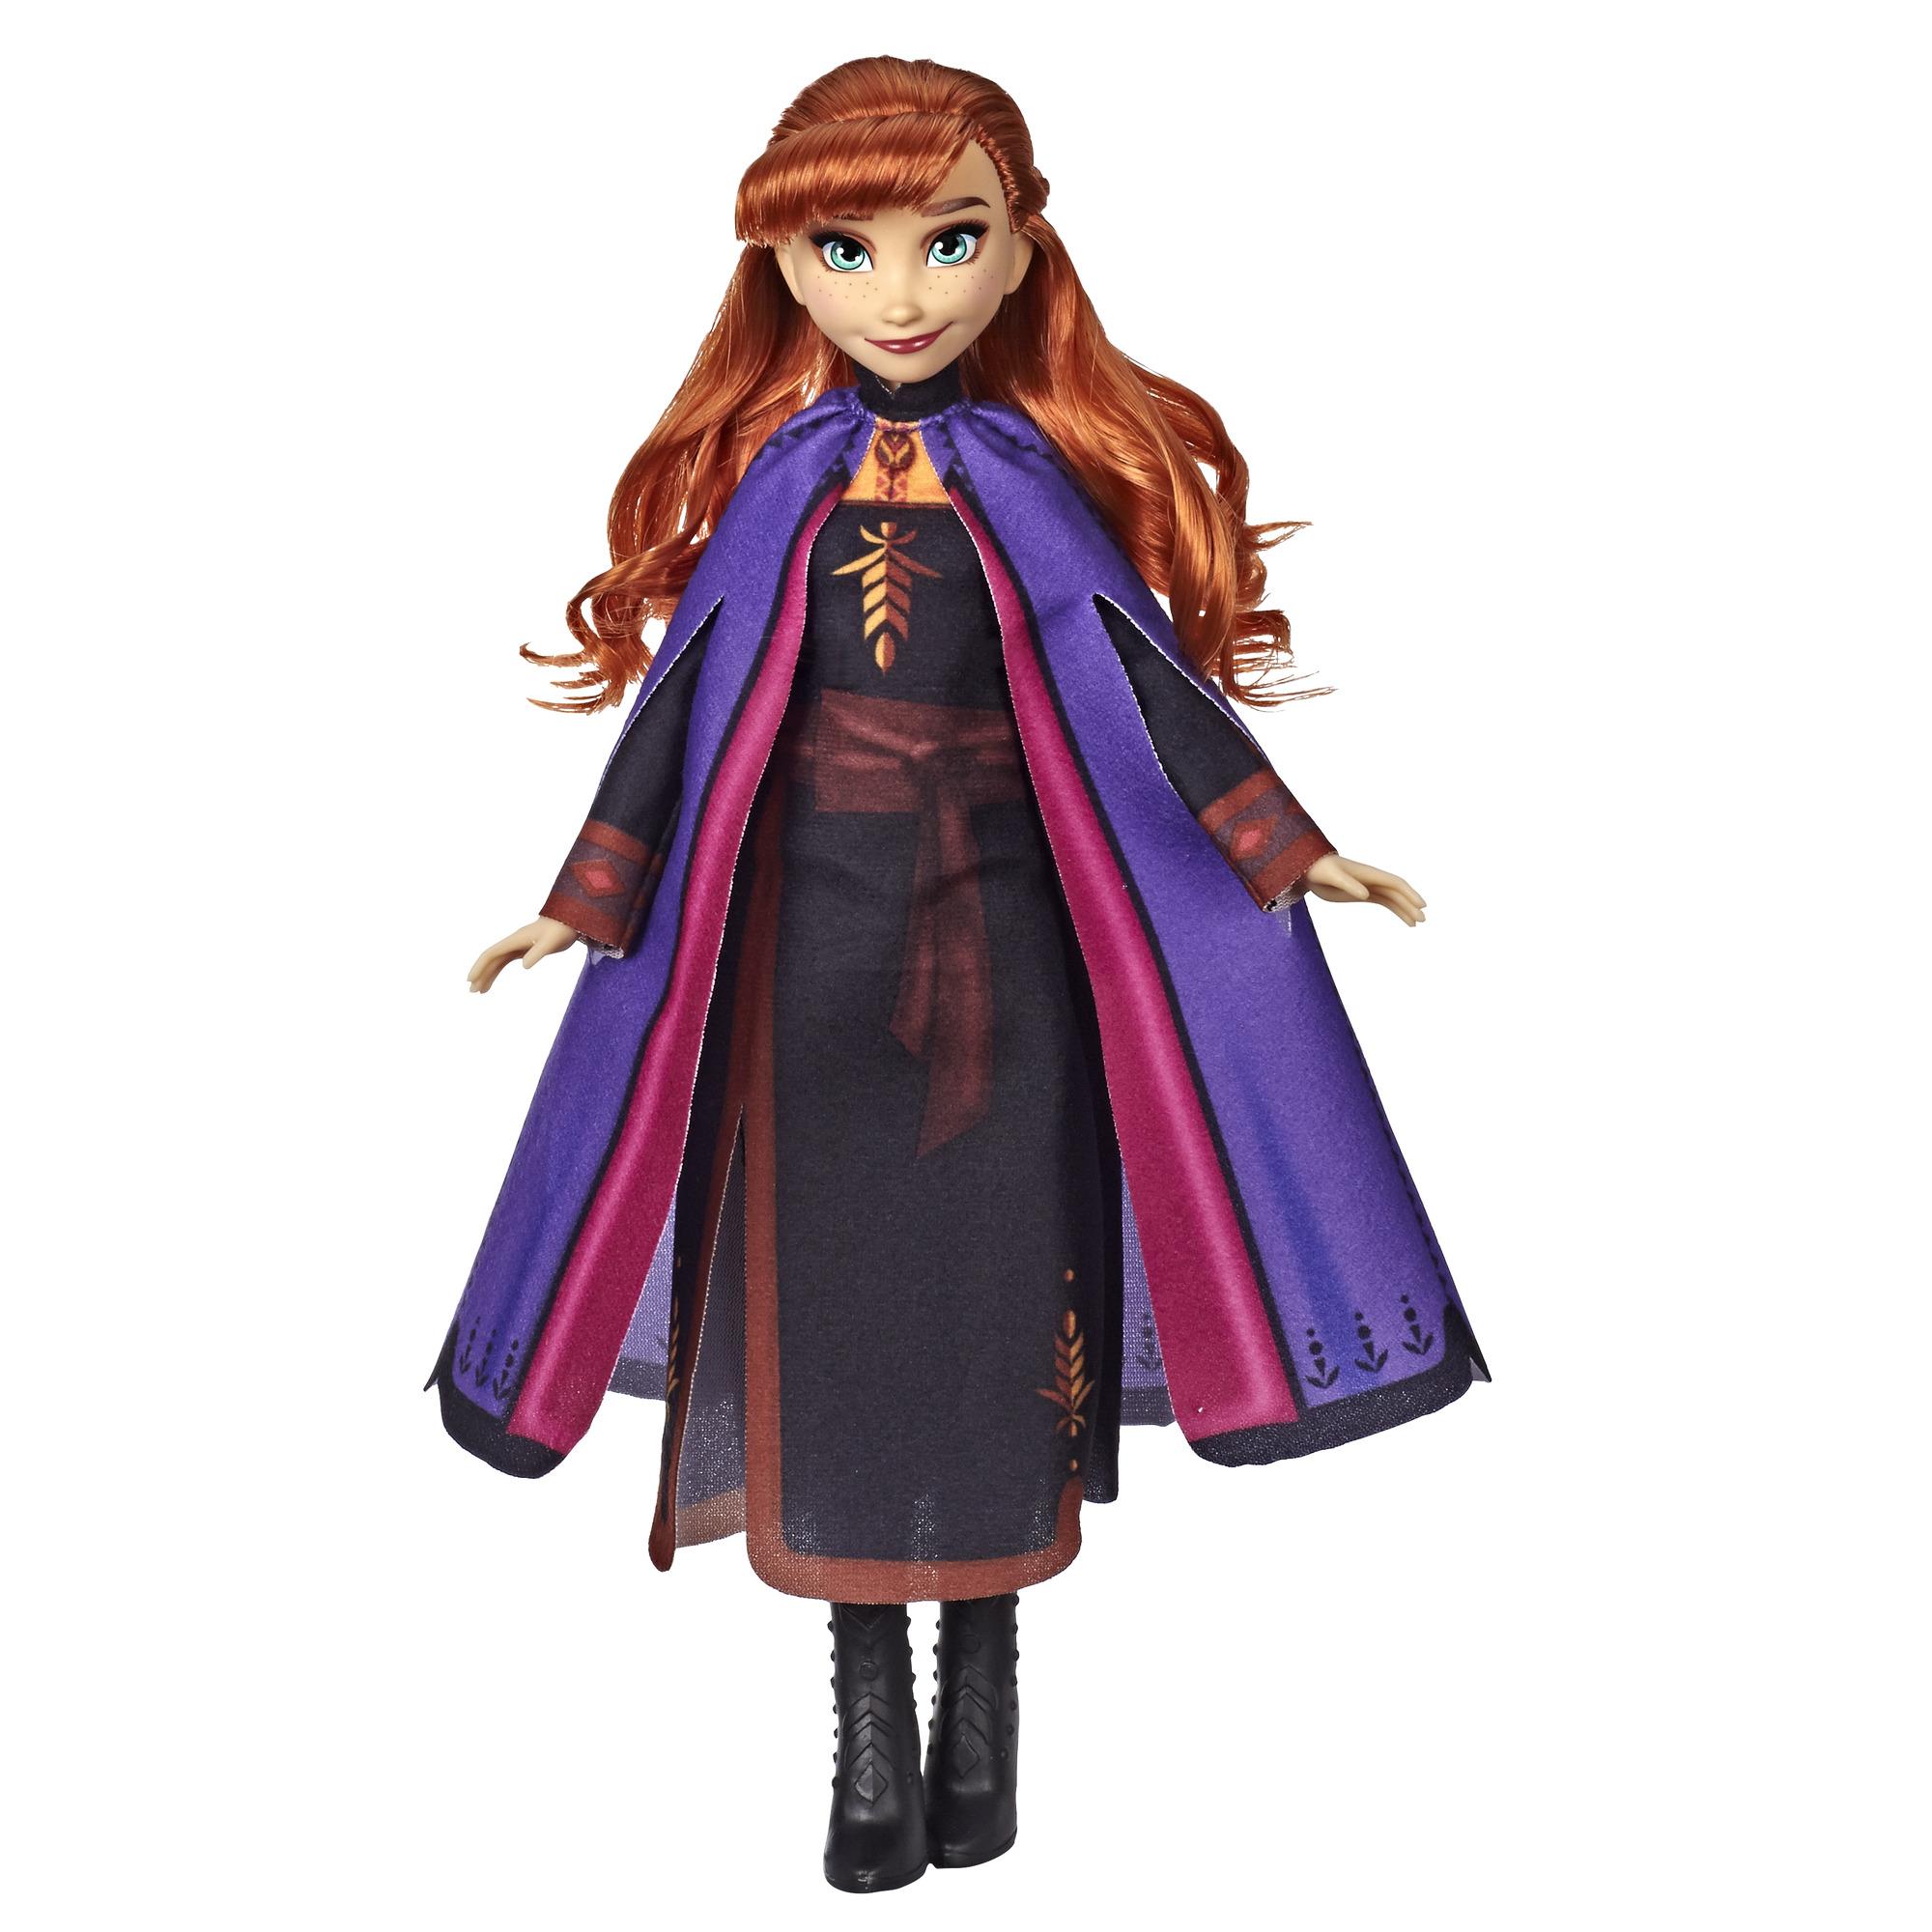 Disney Frozen 2 Anna Fashion Doll $6 + Free Shipping w/ Walmart+ or Orders $35+